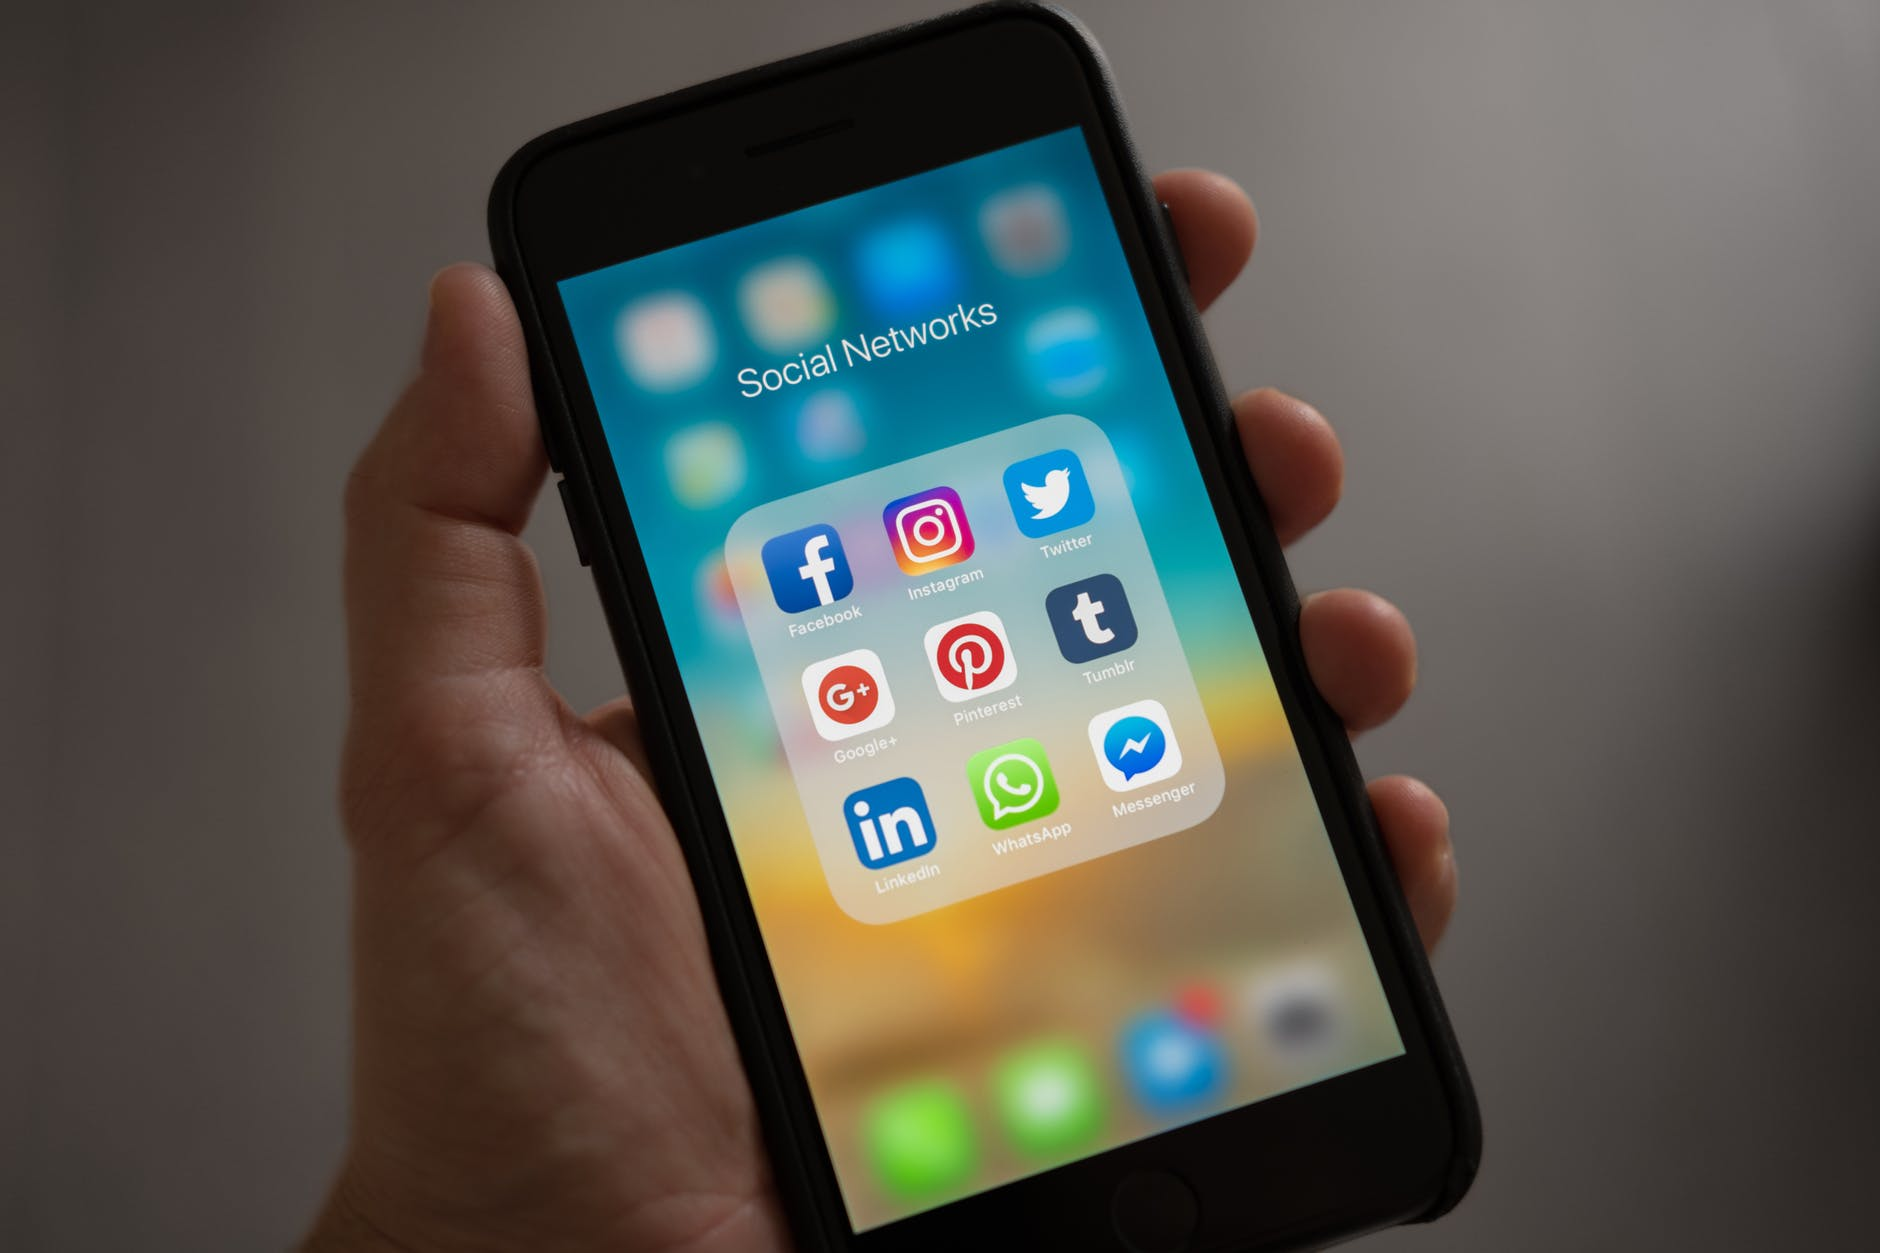 Common social media platforms